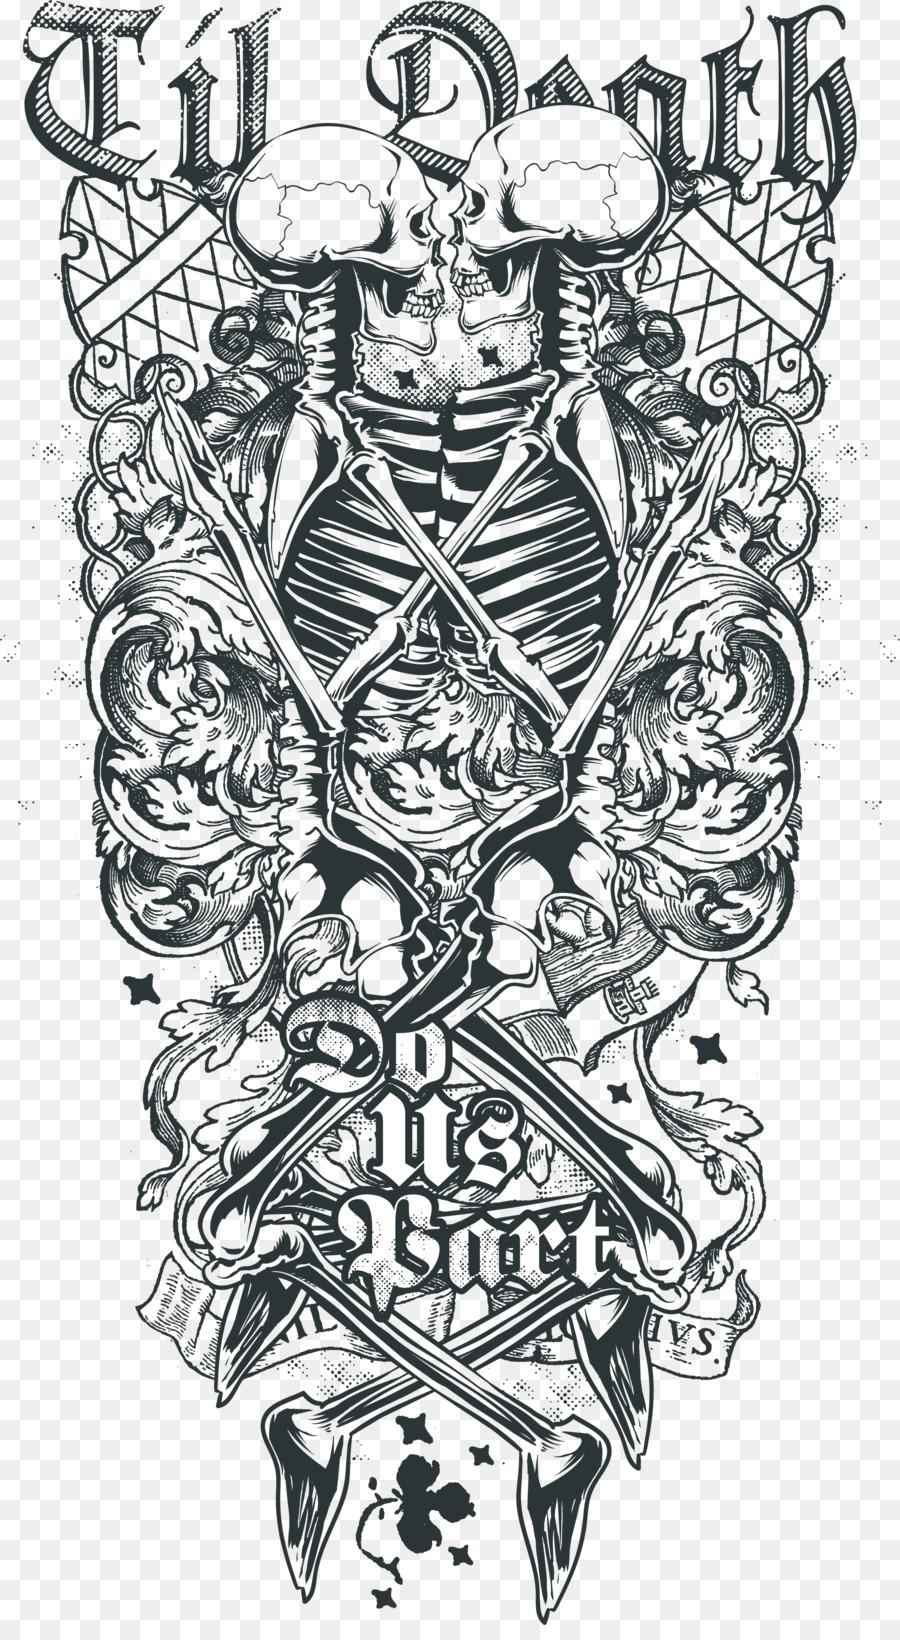 death sleeve tattoo abziehtattoo human skull symbolism depending on the printing of skull. Black Bedroom Furniture Sets. Home Design Ideas